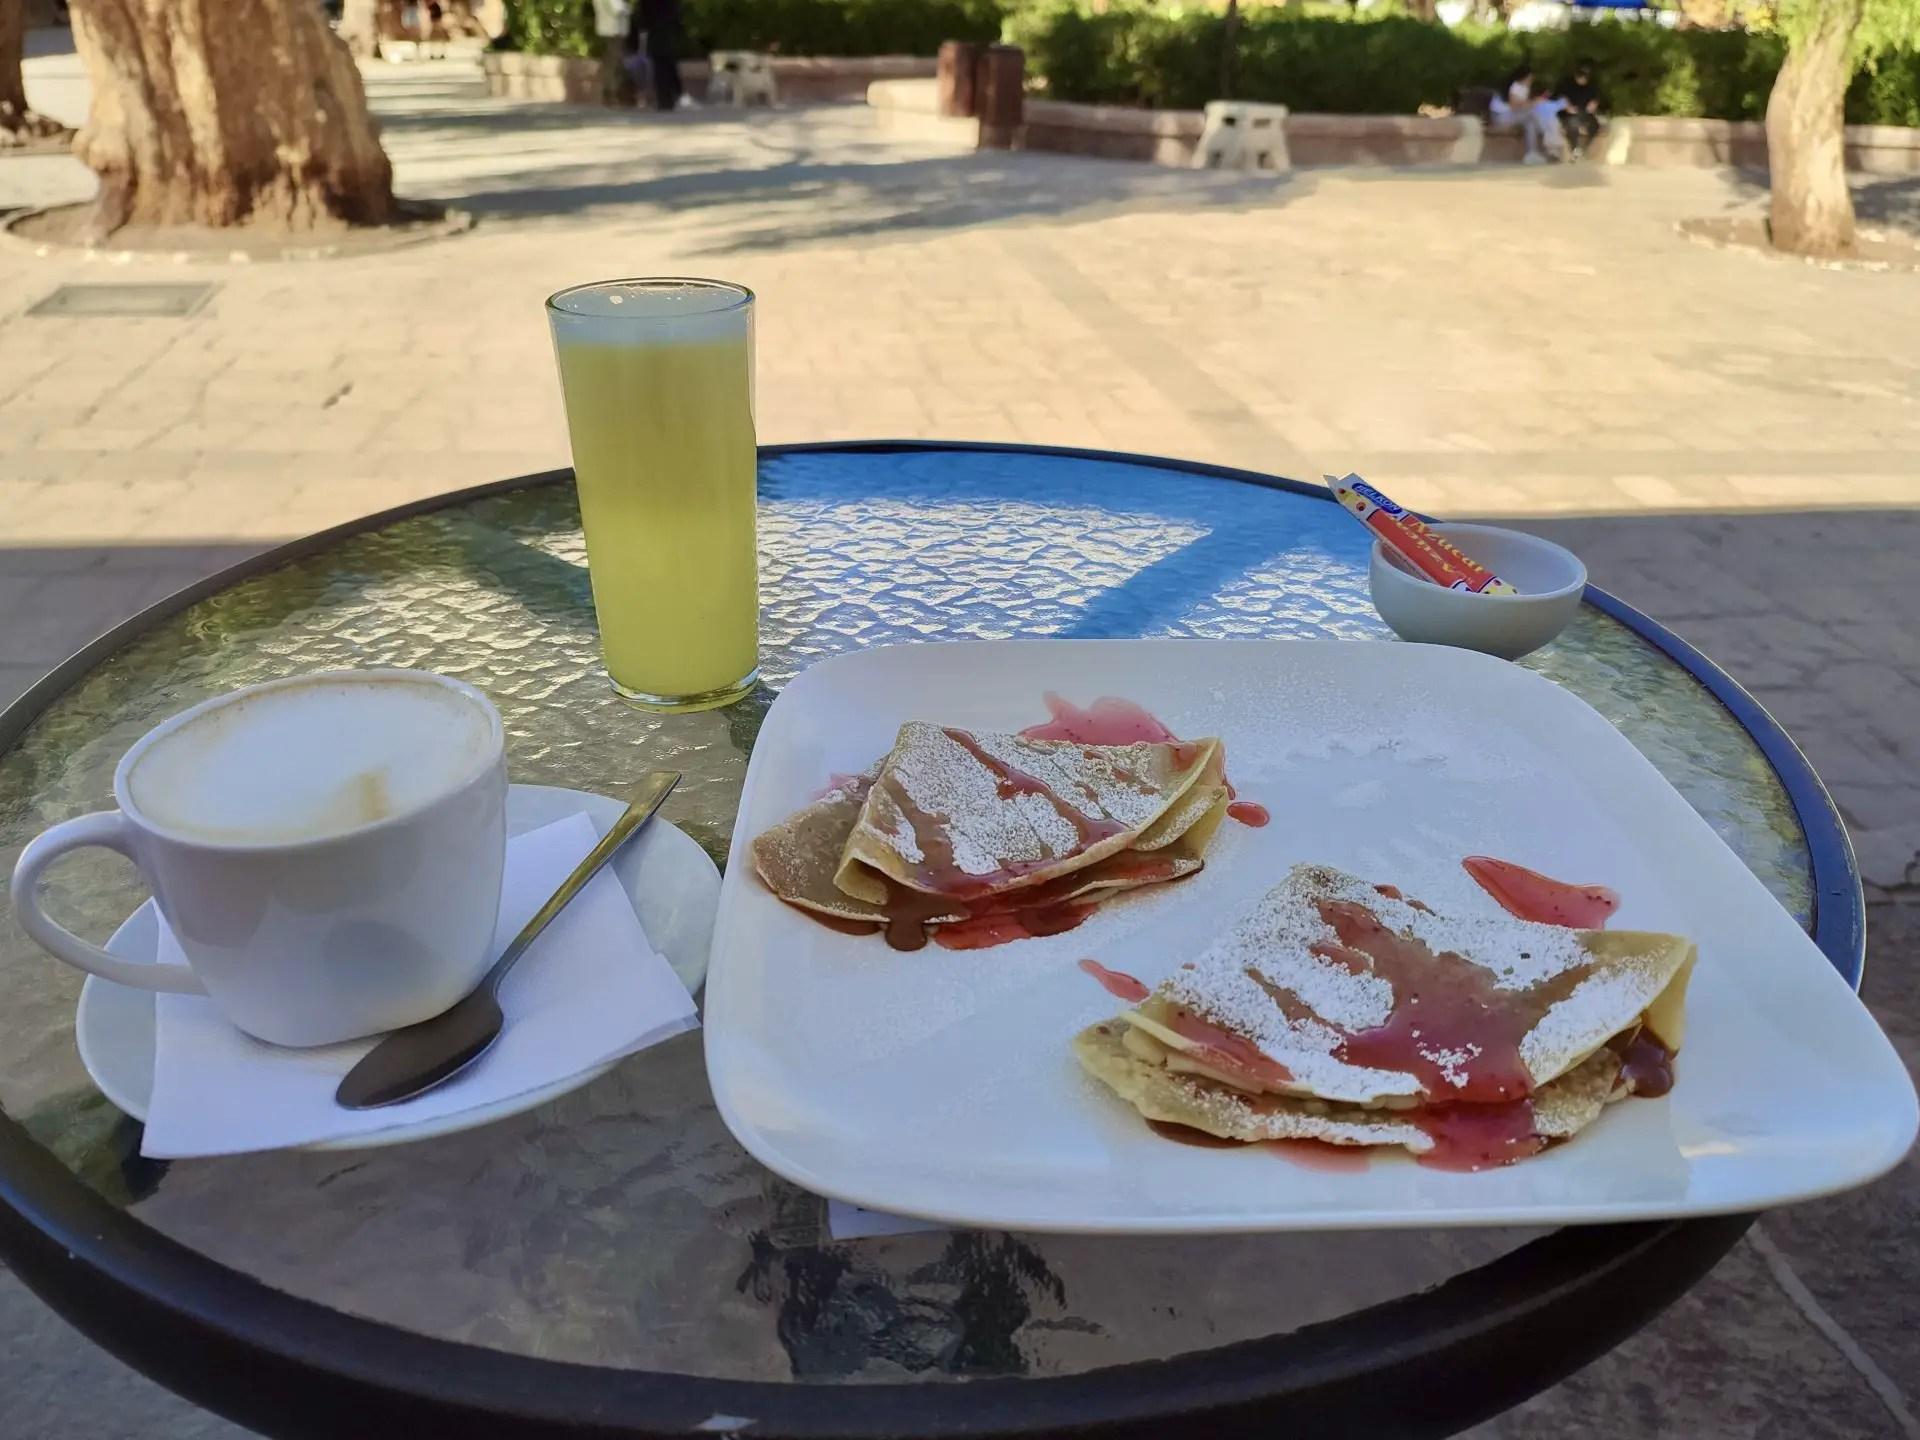 Desayuno frente a la plaza de San Pedro de Atacama.